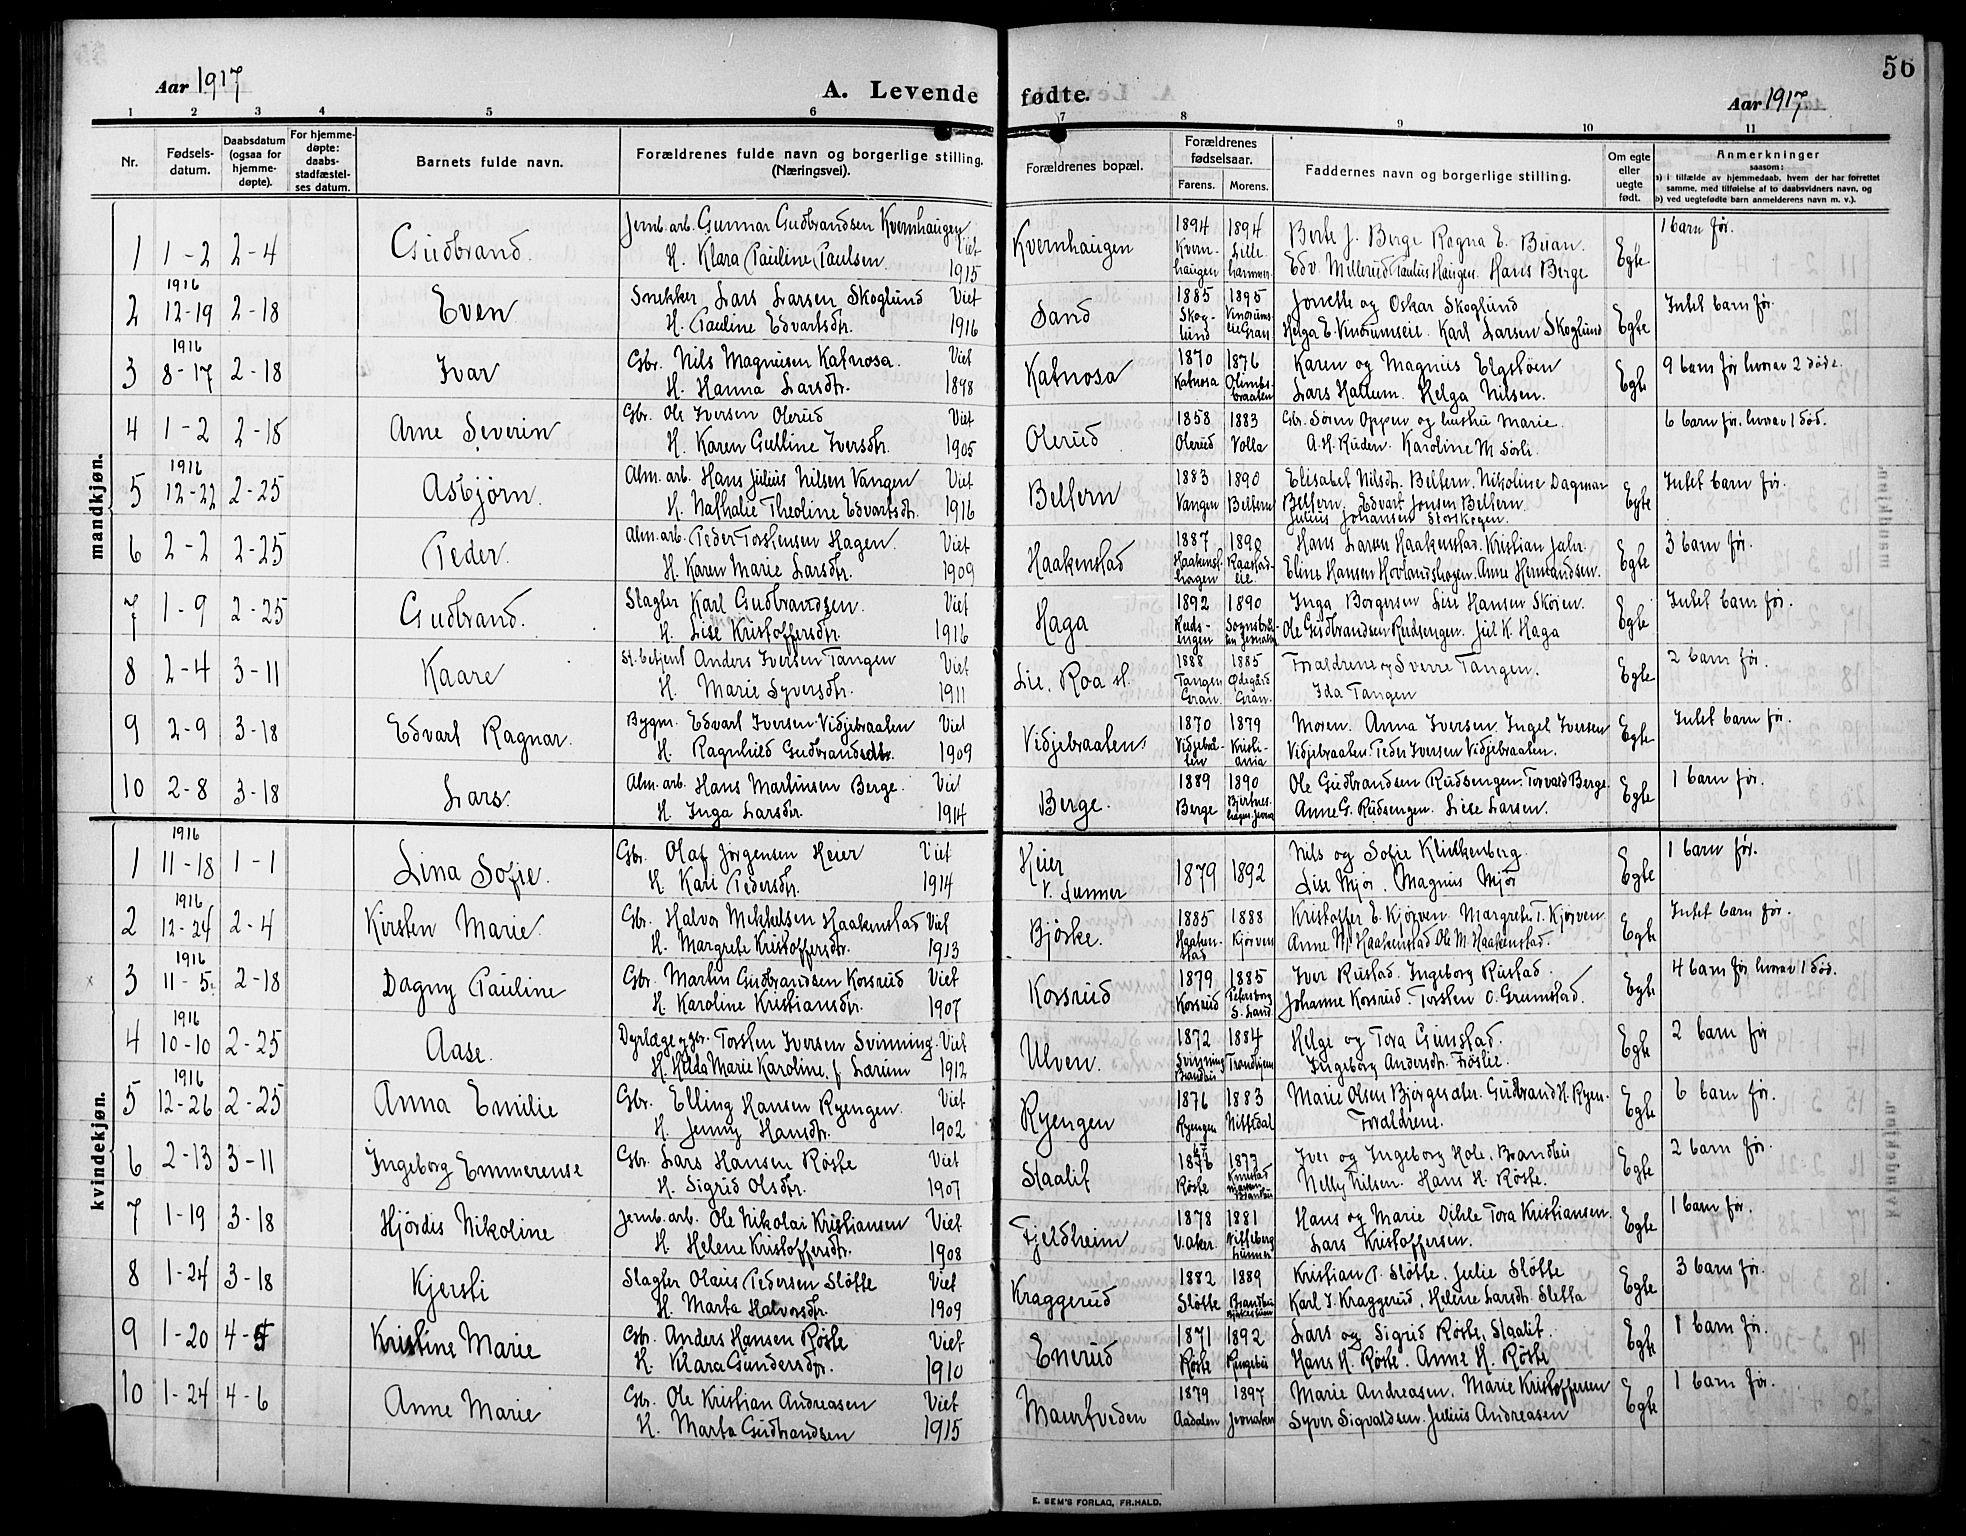 SAH, Lunner prestekontor, H/Ha/Hab/L0001: Klokkerbok nr. 1, 1909-1922, s. 56